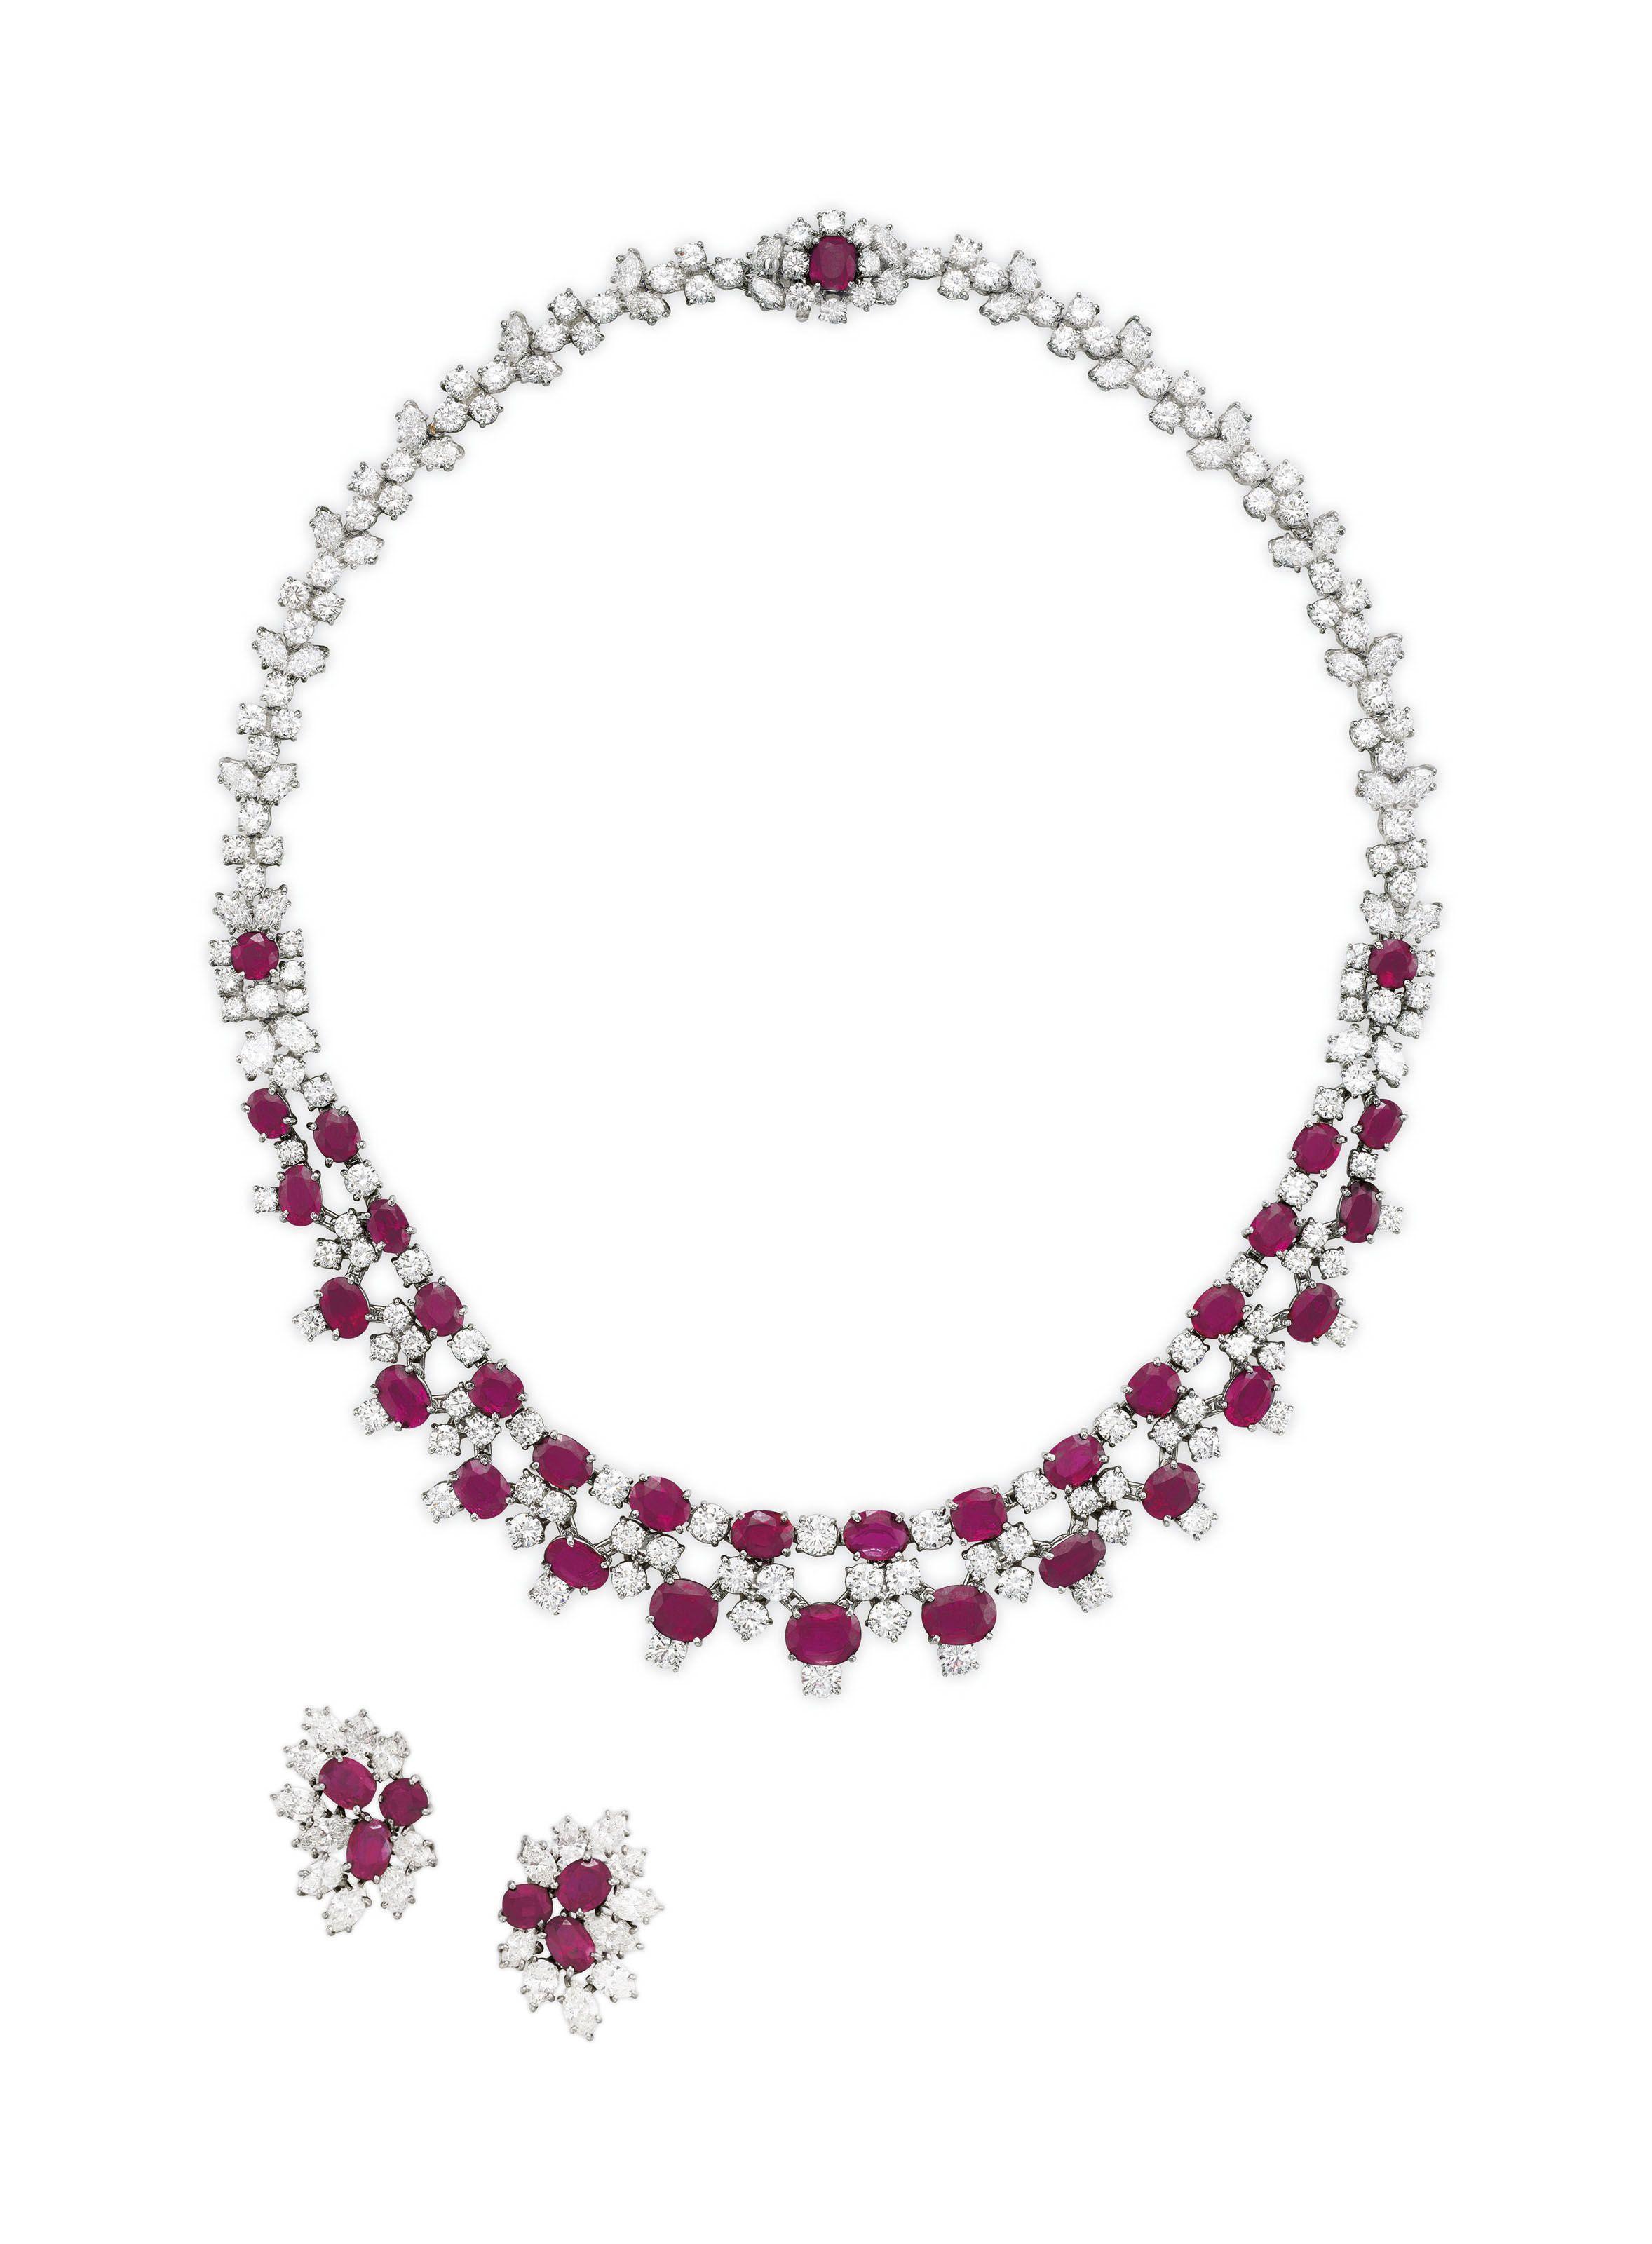 11++ Where to buy ruby jewelry info